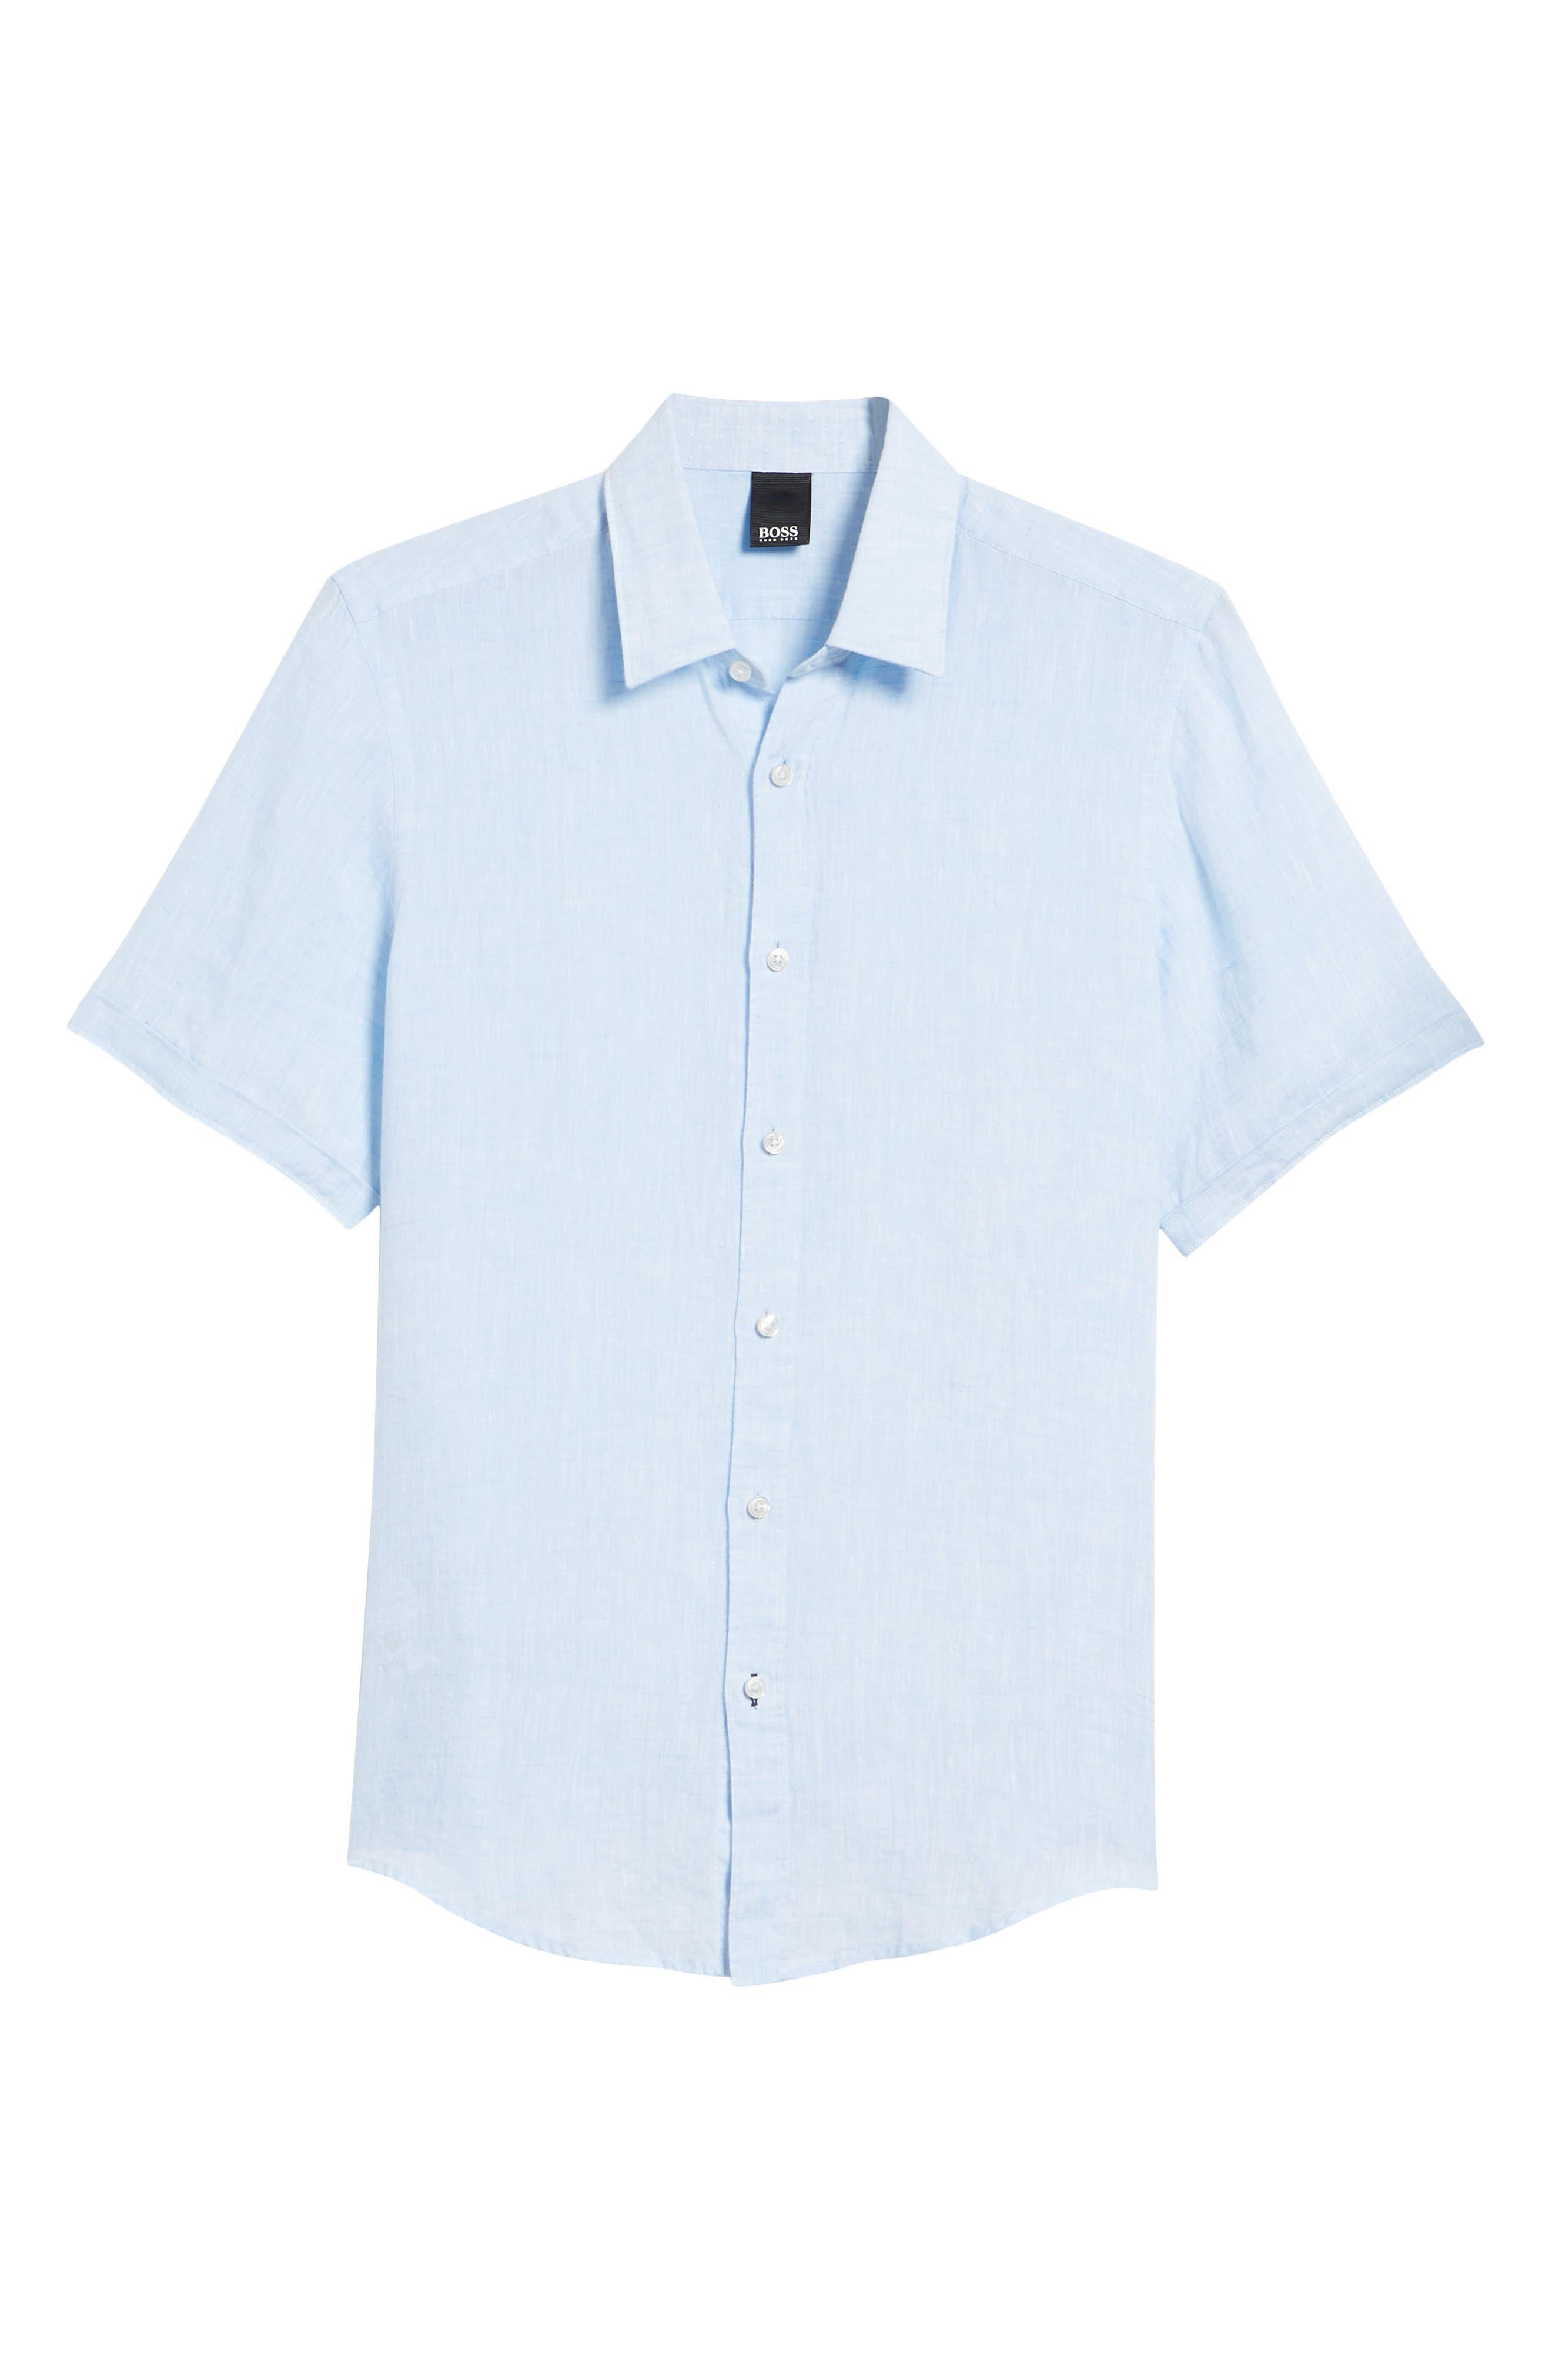 Luka Slim Fit Sport Shirt,                             Alternate thumbnail 6, color,                             Blue